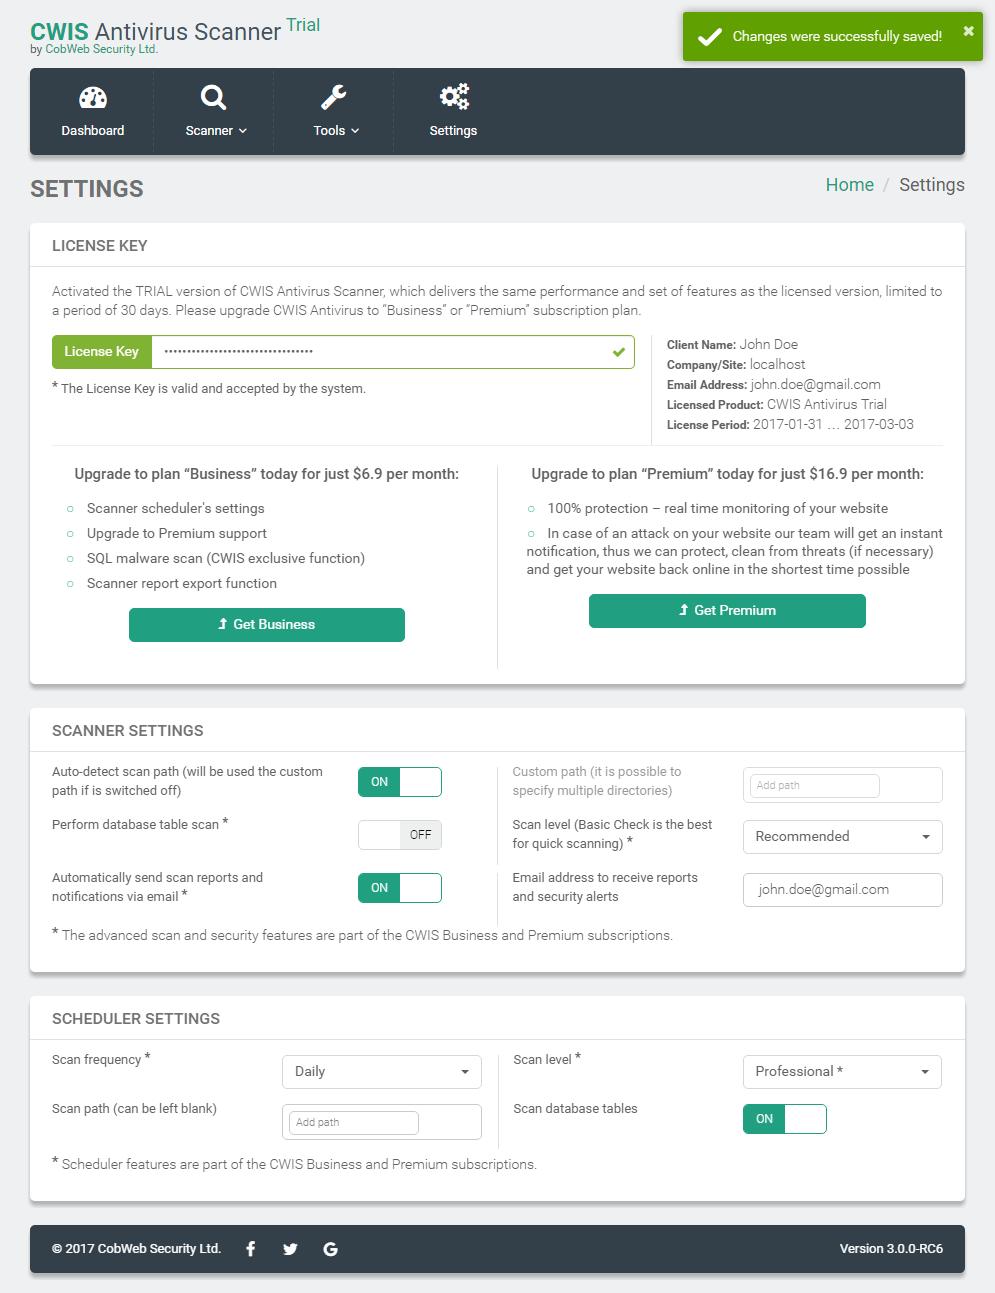 Antivirus Scanner & Scheduler Settings Page